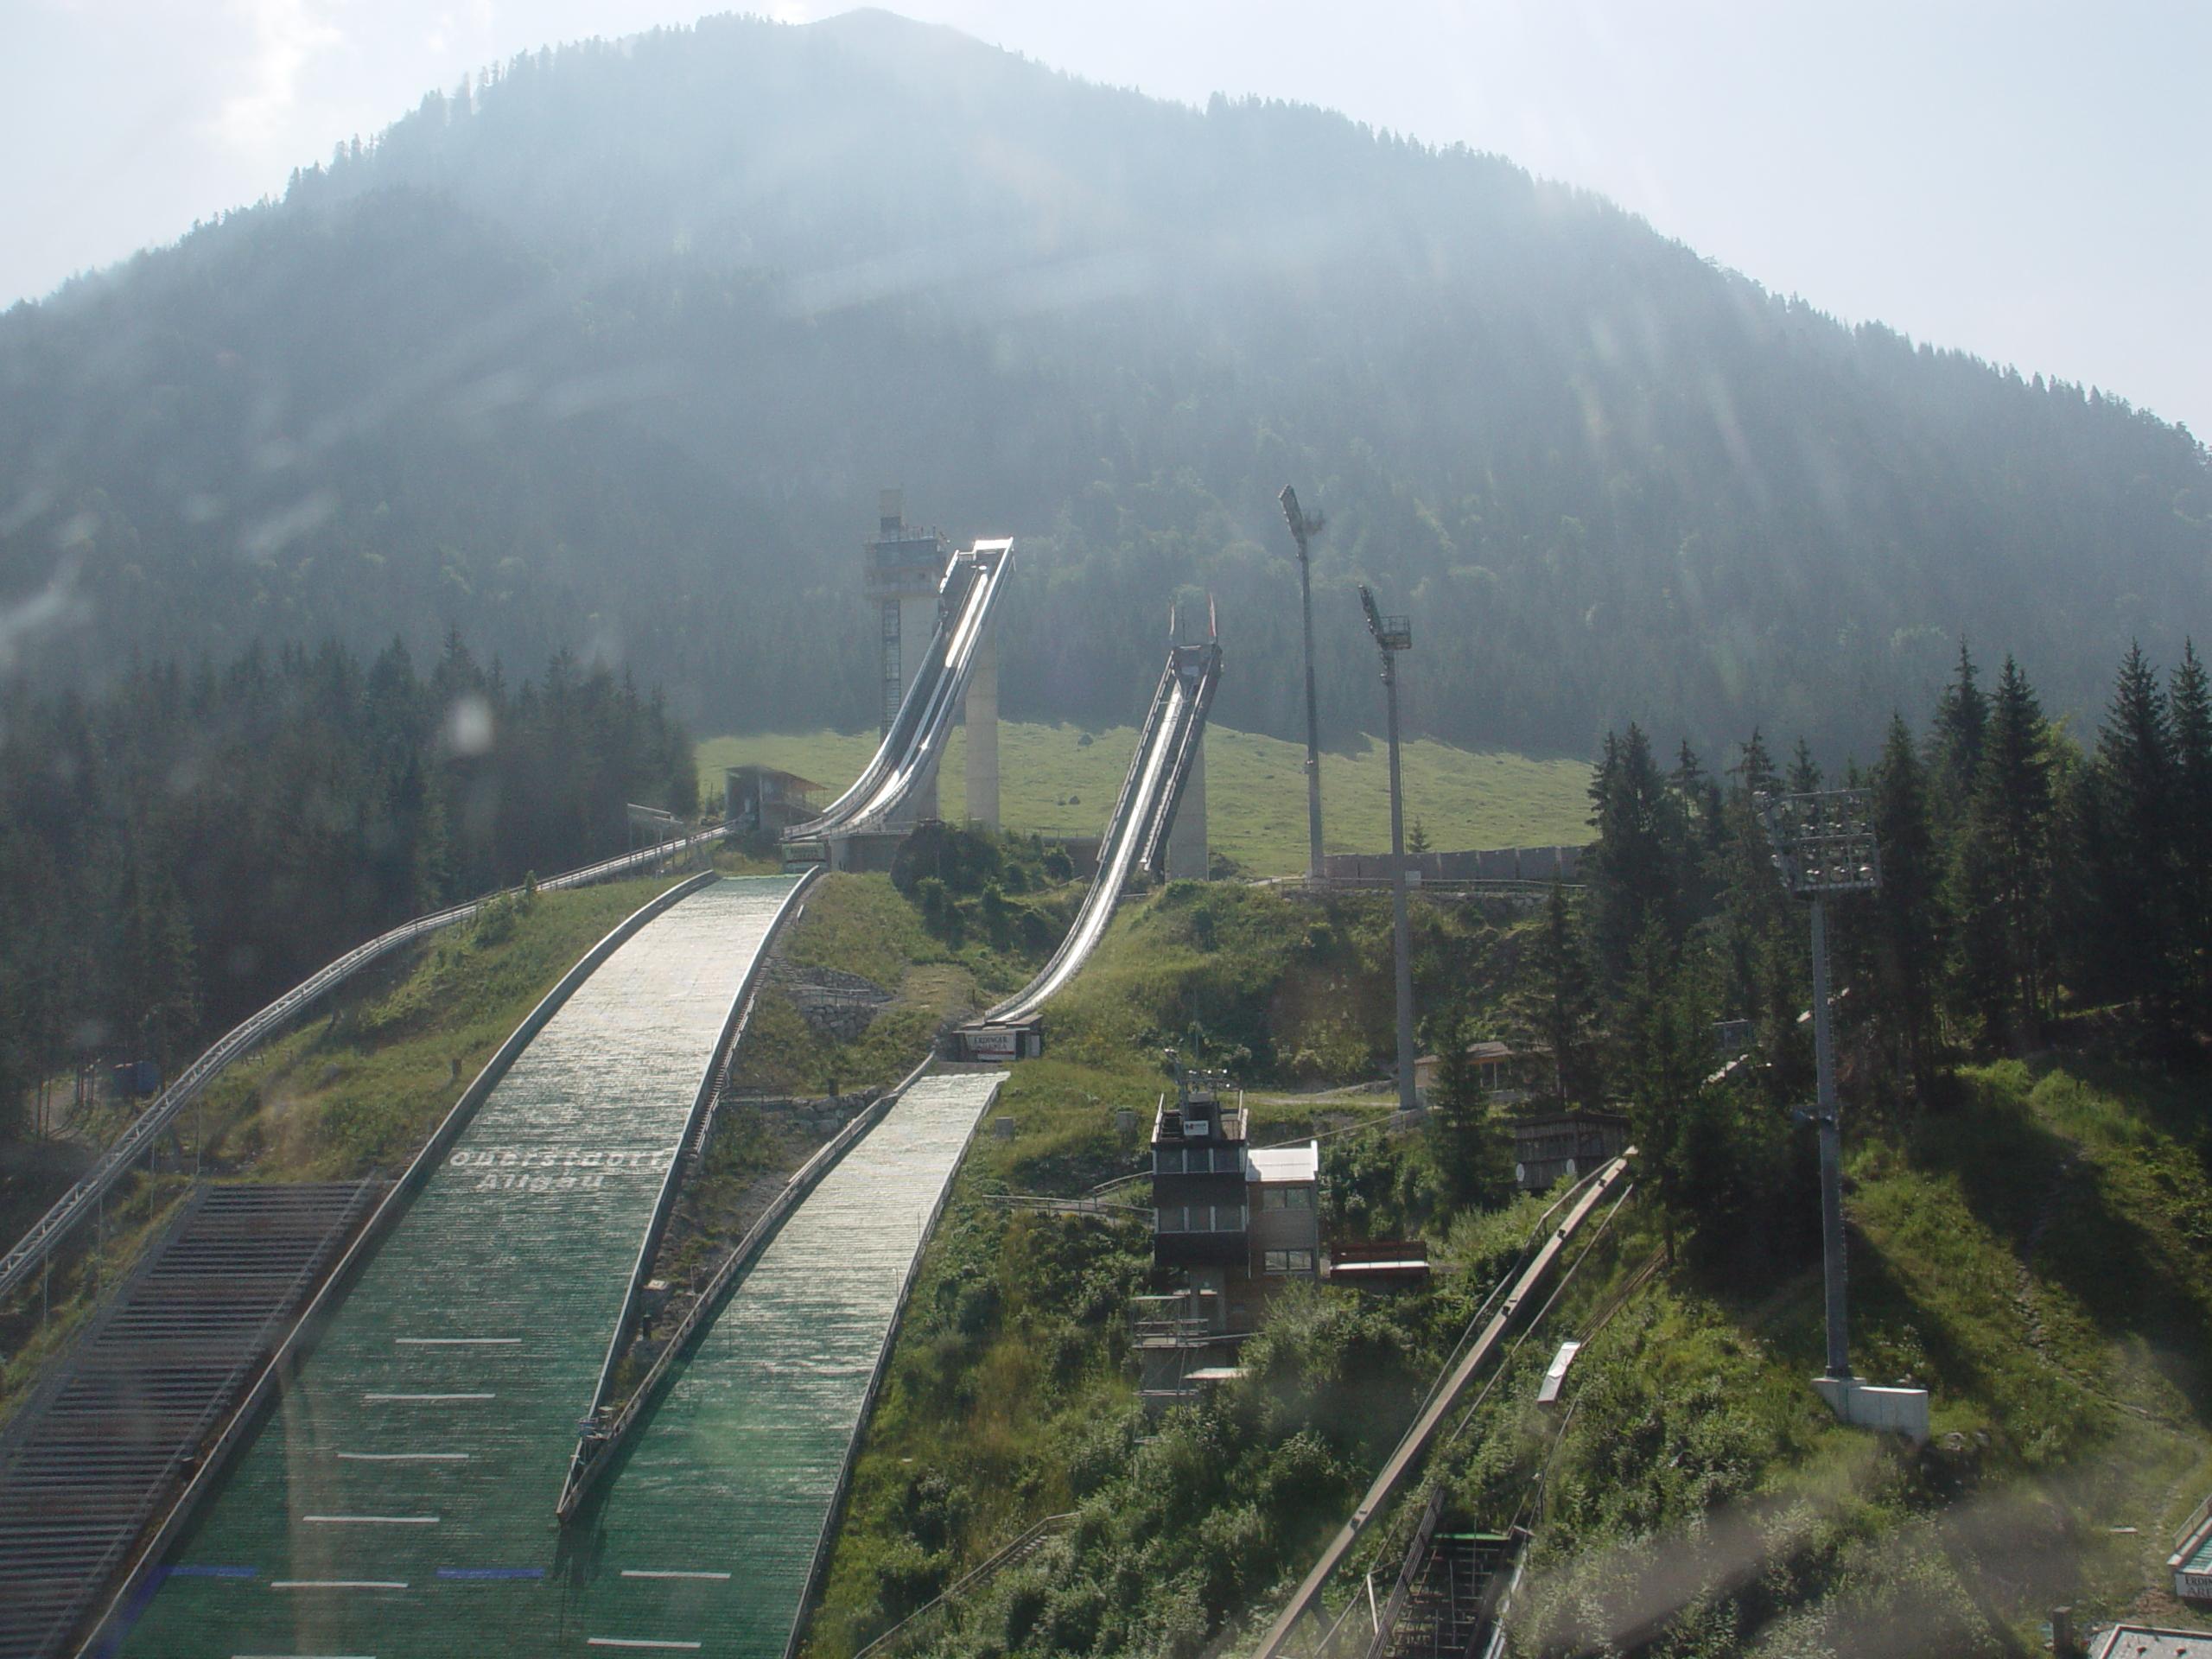 Schanzen Oberstdorf